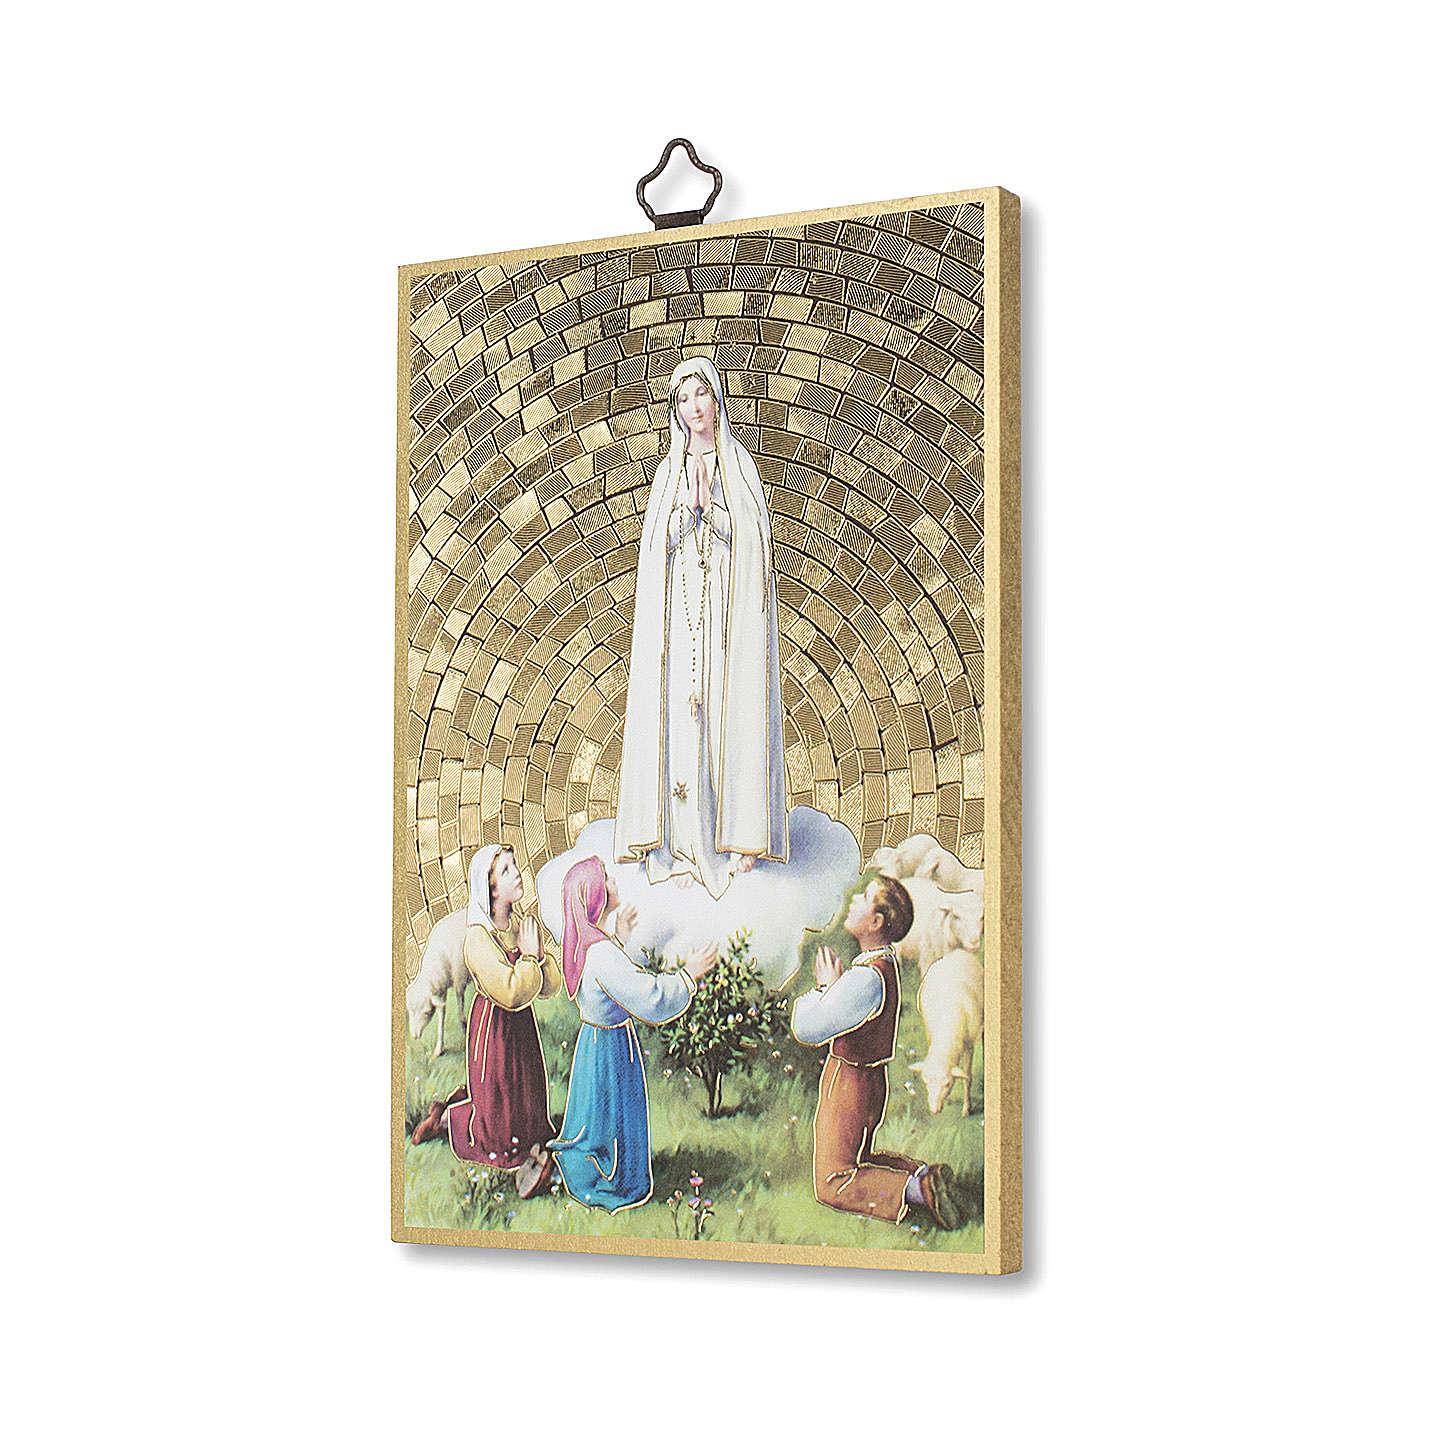 Icono sobre madera Apararición de Fátima con Pastores 3